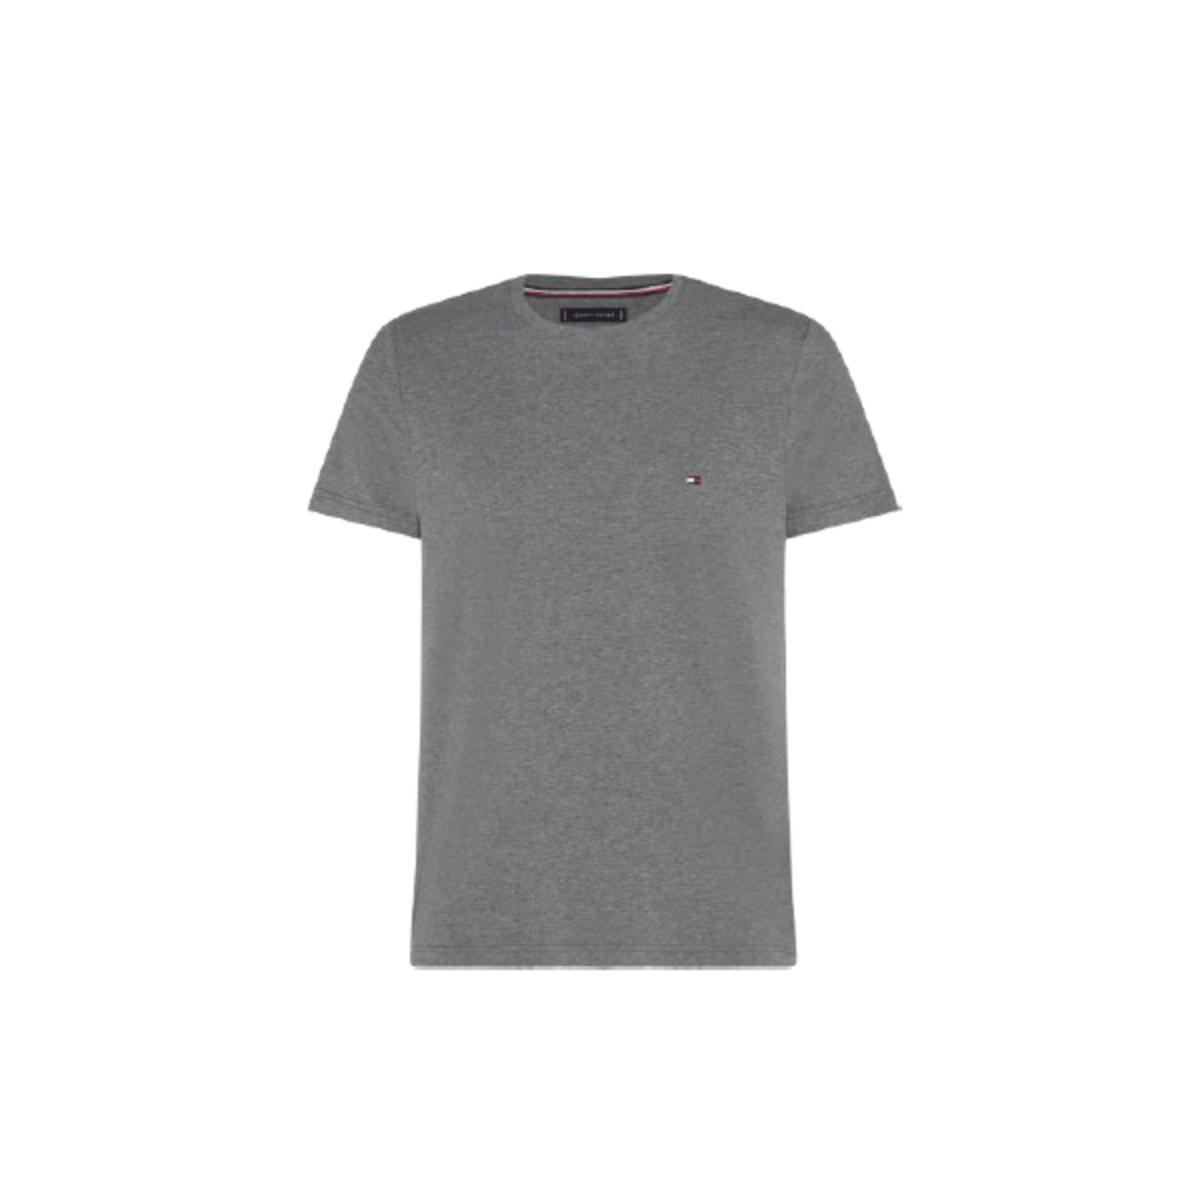 Camiseta Masculina Tommy Thmw0mw17002 Thpg5 Cinza